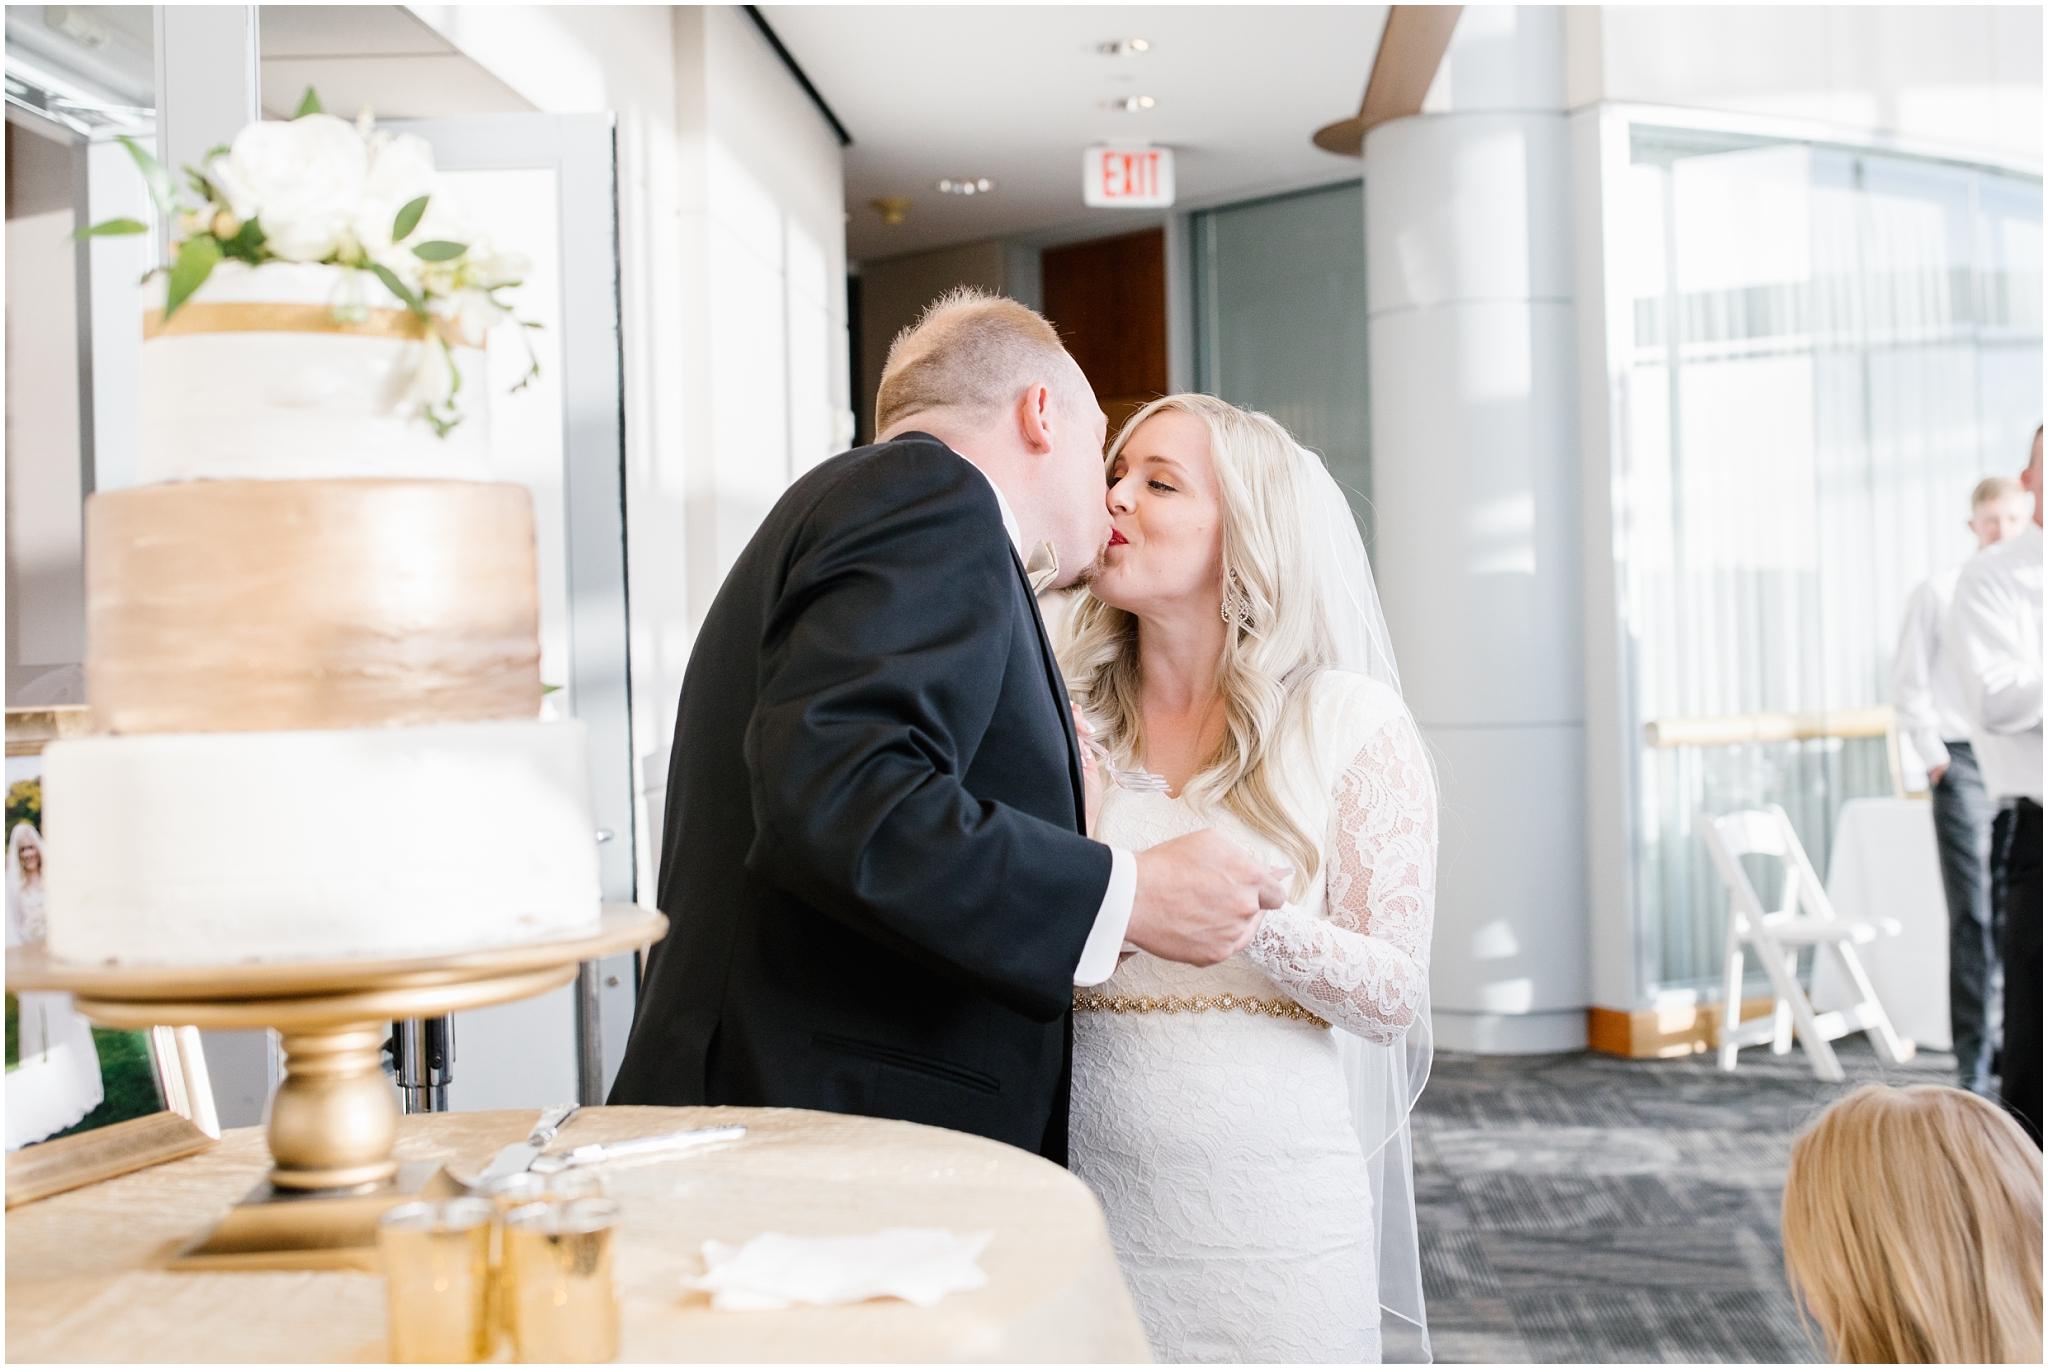 CherylandTyler-525_Lizzie-B-Imagery-Utah-Wedding-Photographer-Salt-Lake-City-Temple-Wells-Fargo-Building-Reception.jpg